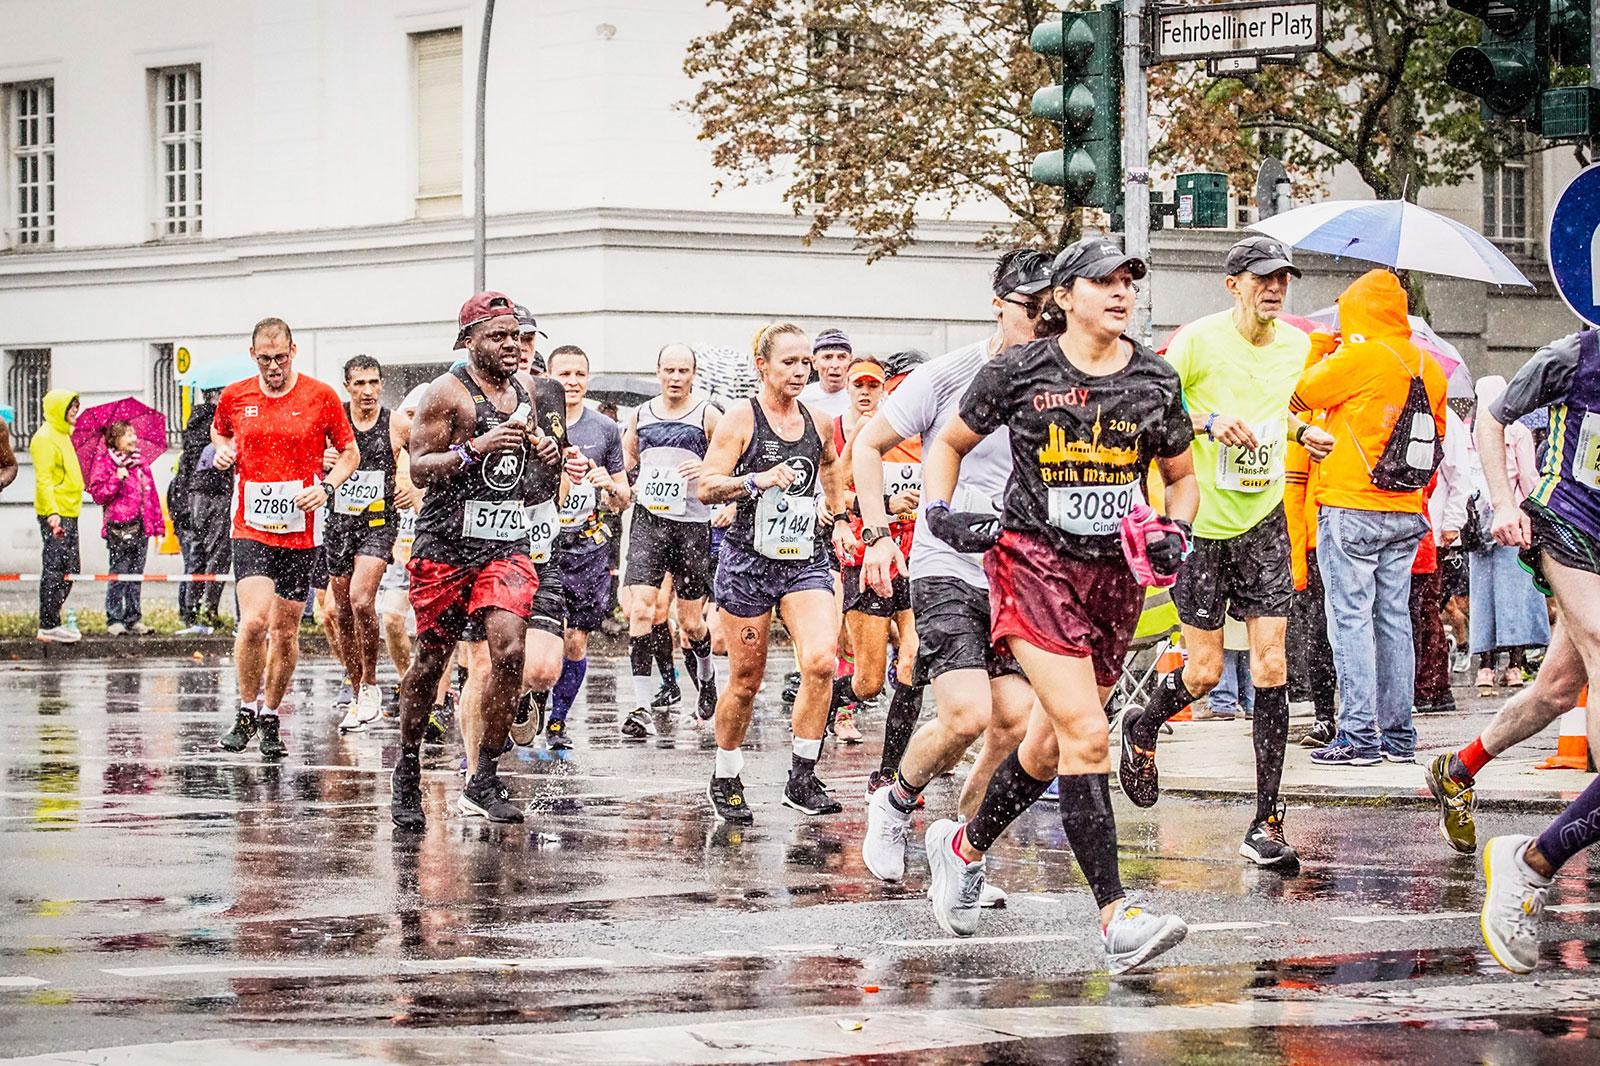 Berlin Marathon review: race photos